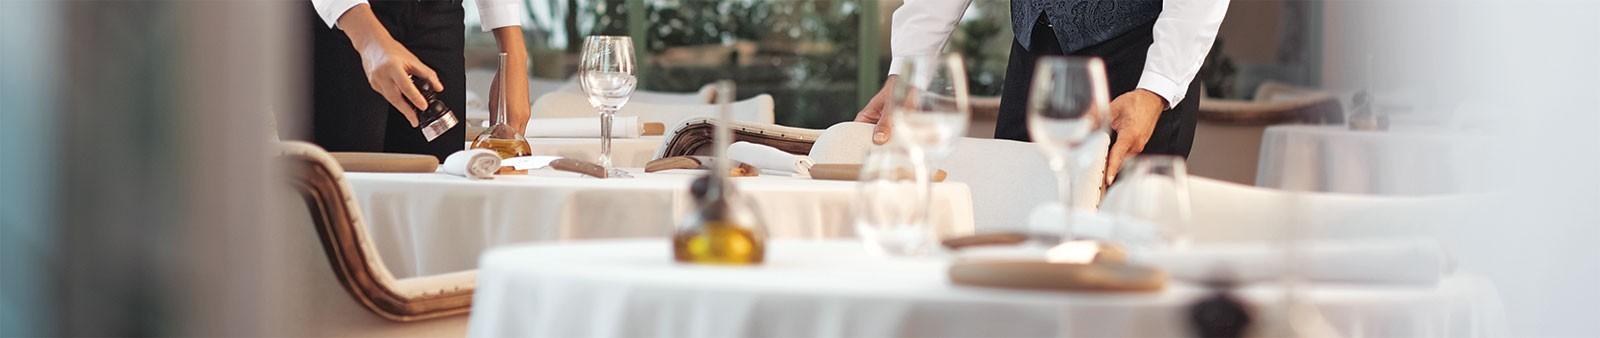 Hemden & Blusen - Service & Hotellerie